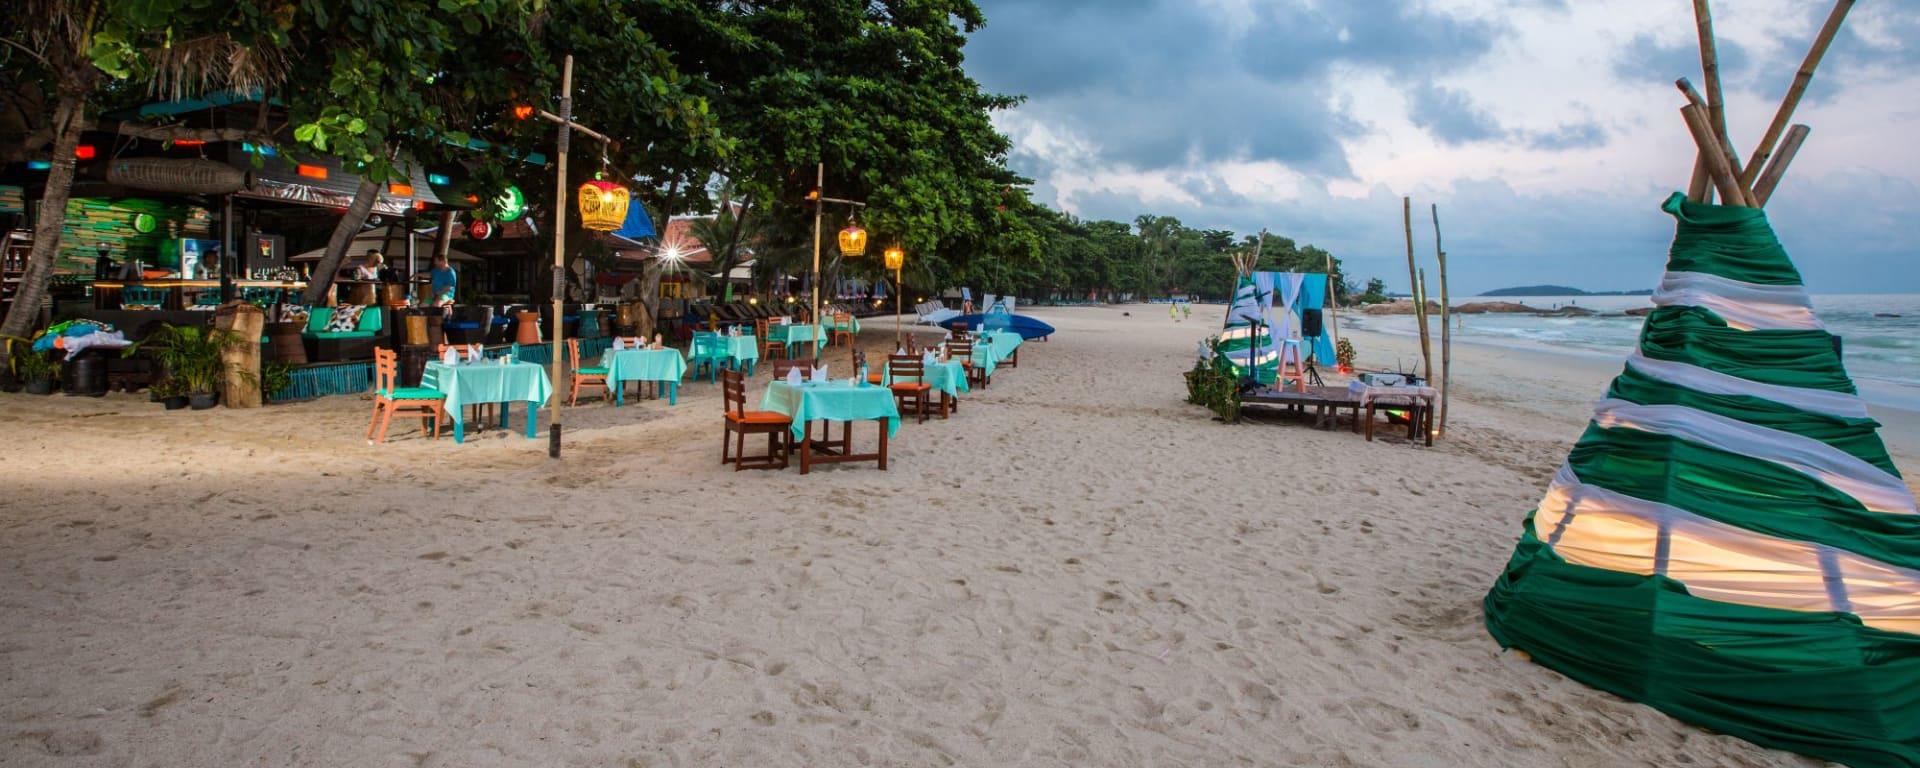 Fair House Beach Resort & Hotel à Ko Samui: Dinning at the beach